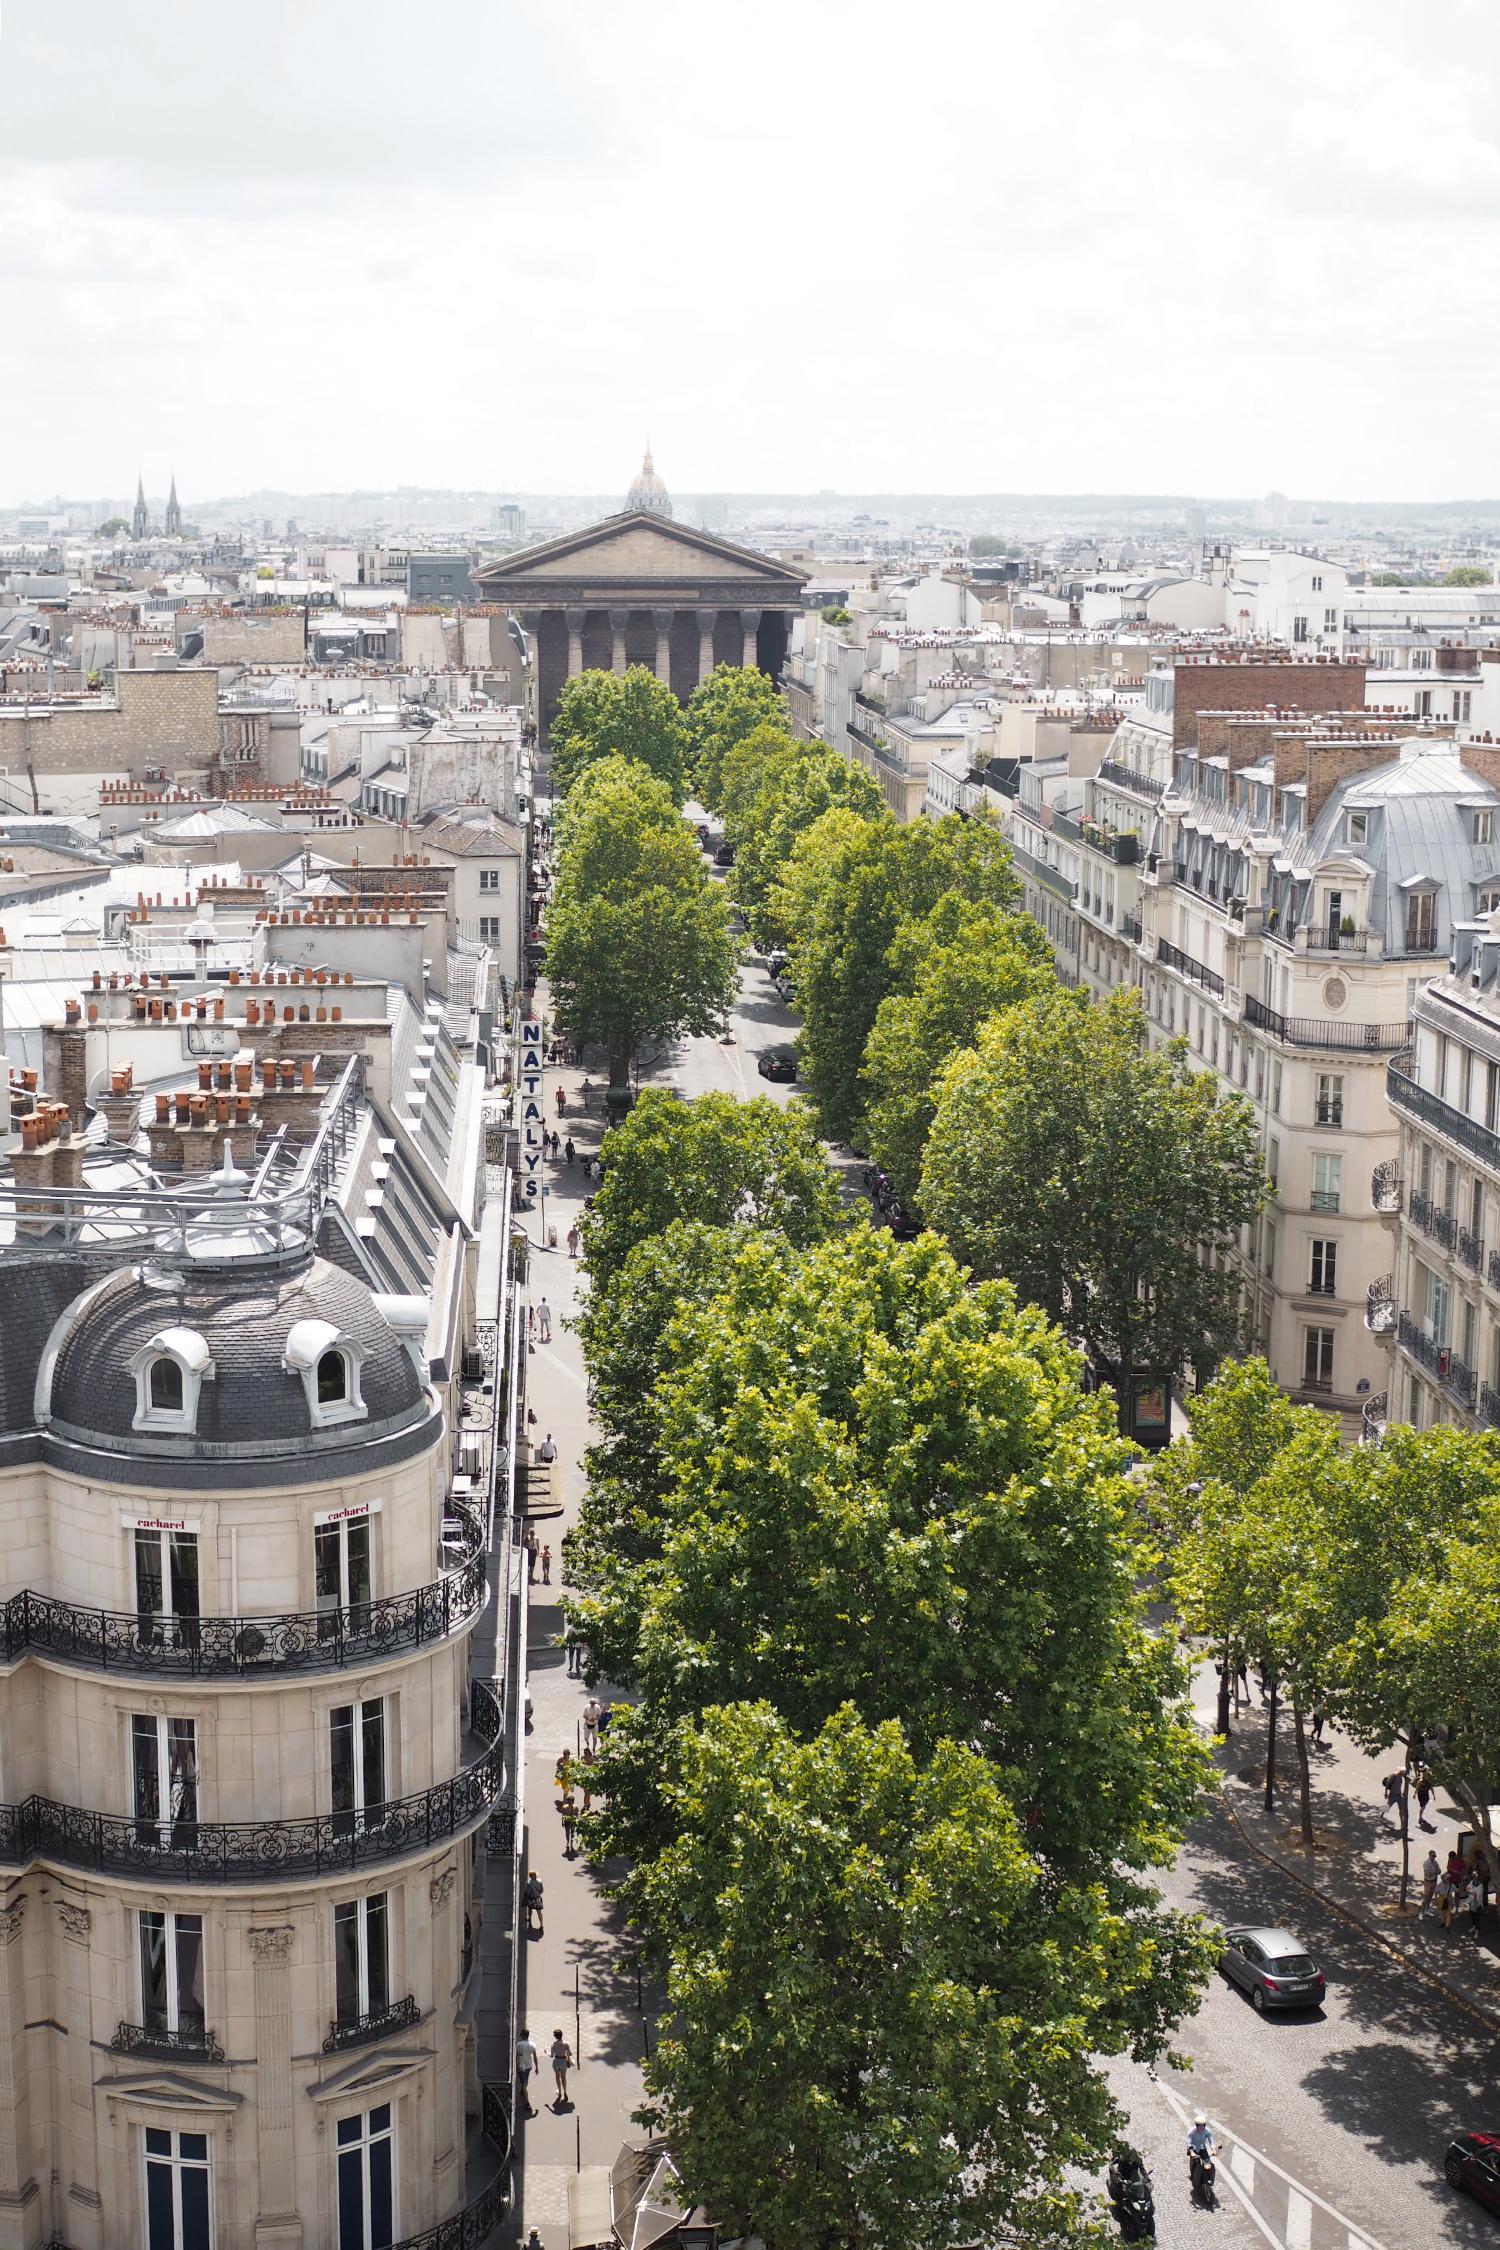 Char and the city, www.charandthecity.com, Pariisi, ravintola, suosittelu, vinkki